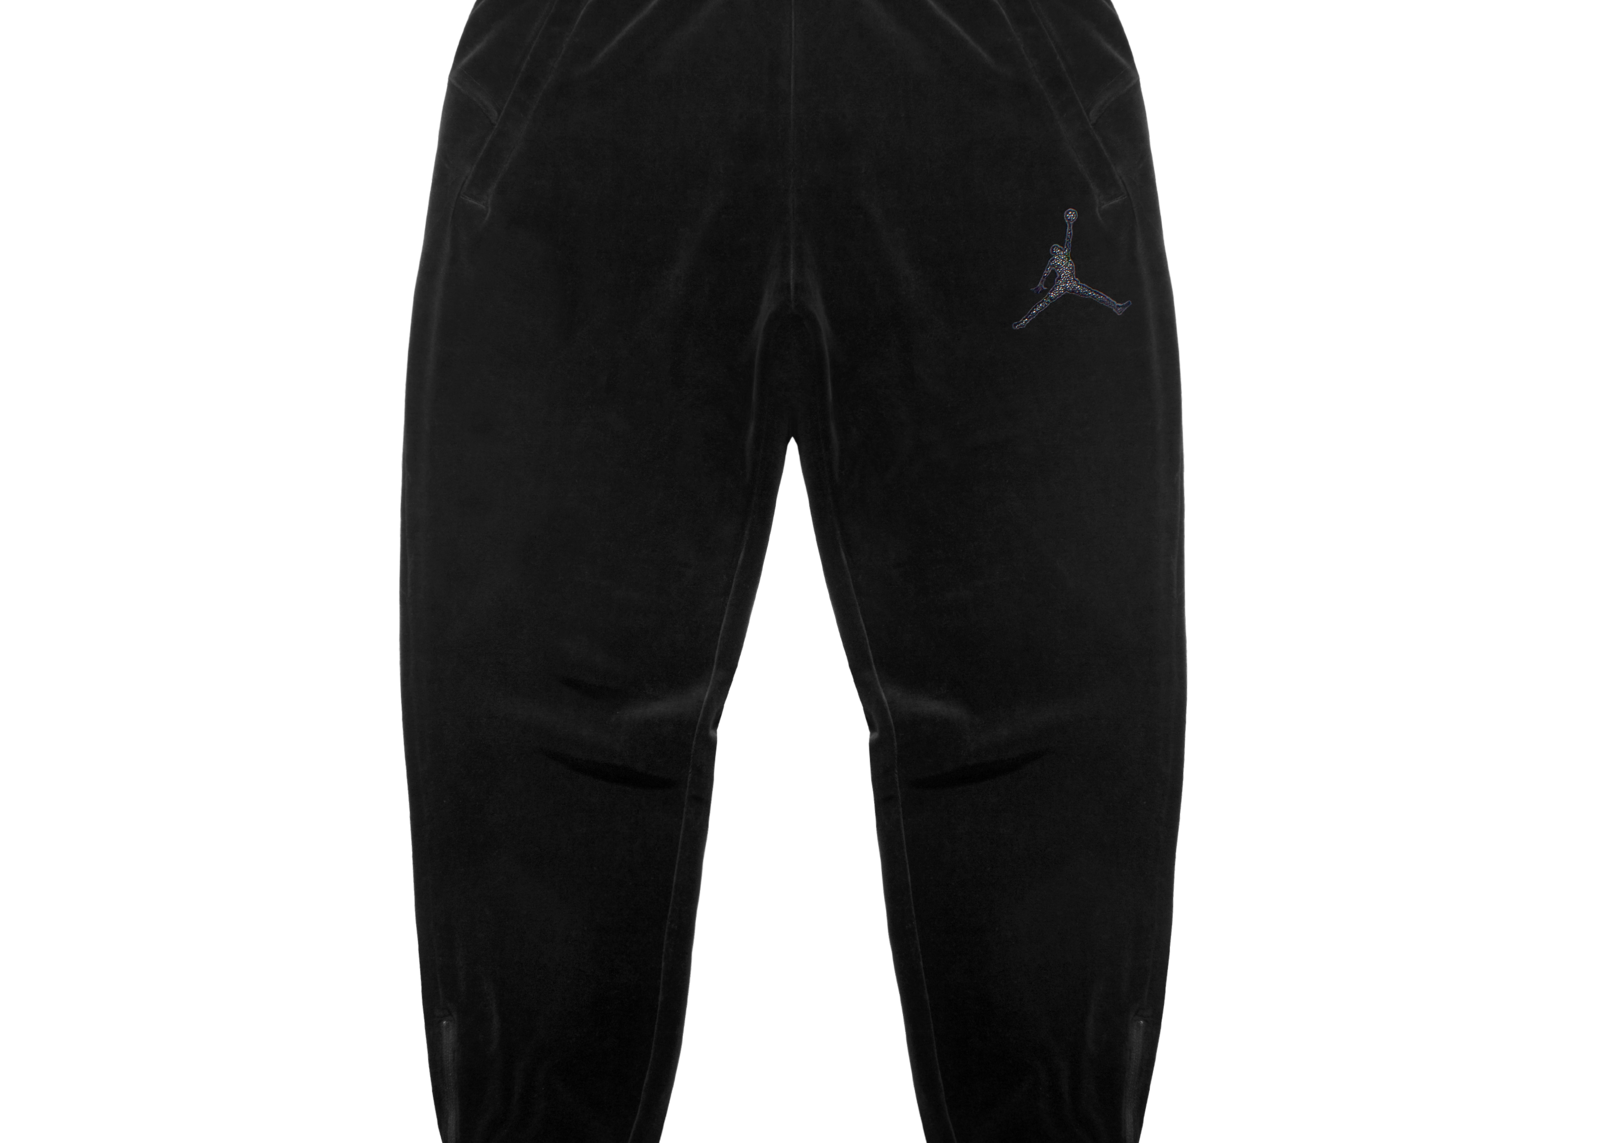 82a10558ffcf Jordan x OVO All-Star Collection - Nike News